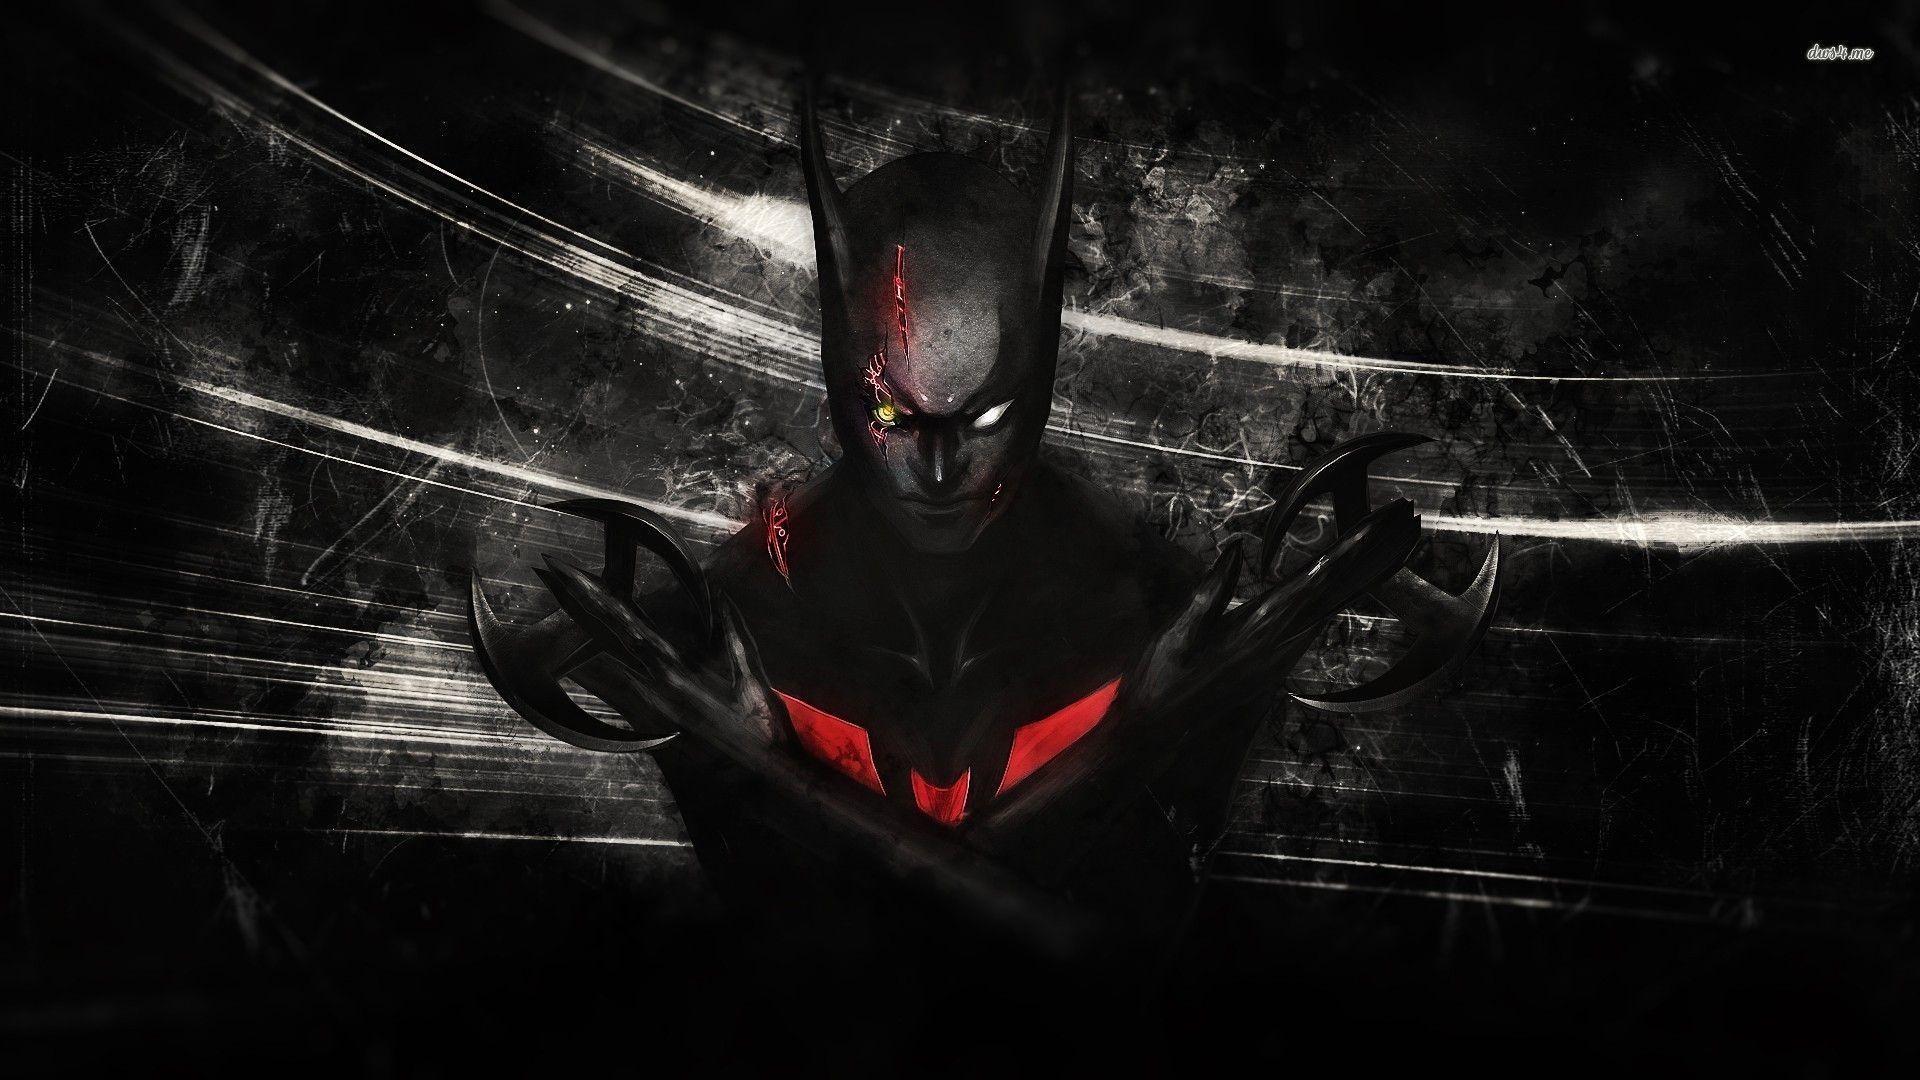 Batman Beyond Wallpaper Hd 1080p – clipartsgram.com